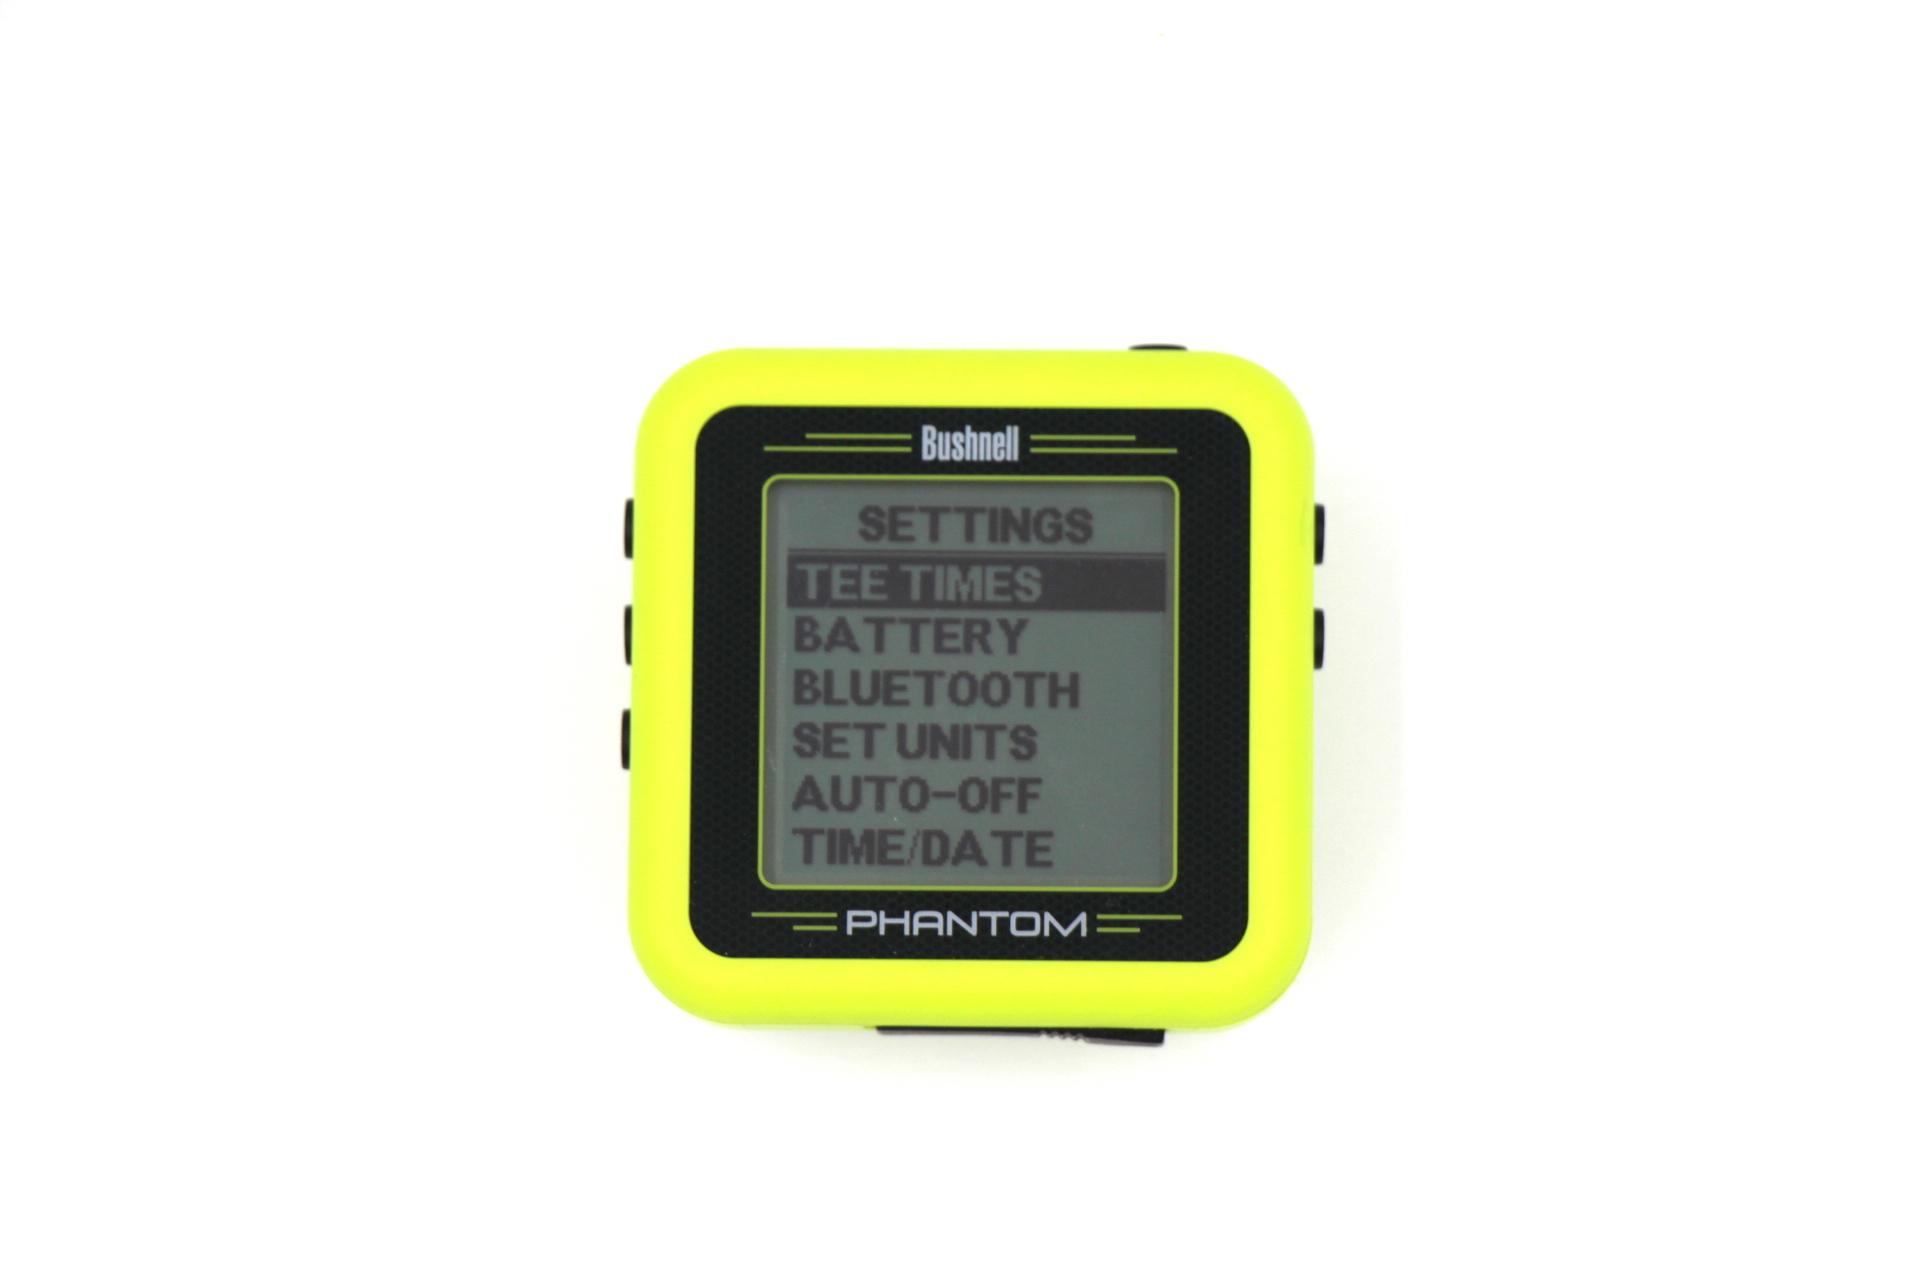 Bushnell Phantom GPS Device